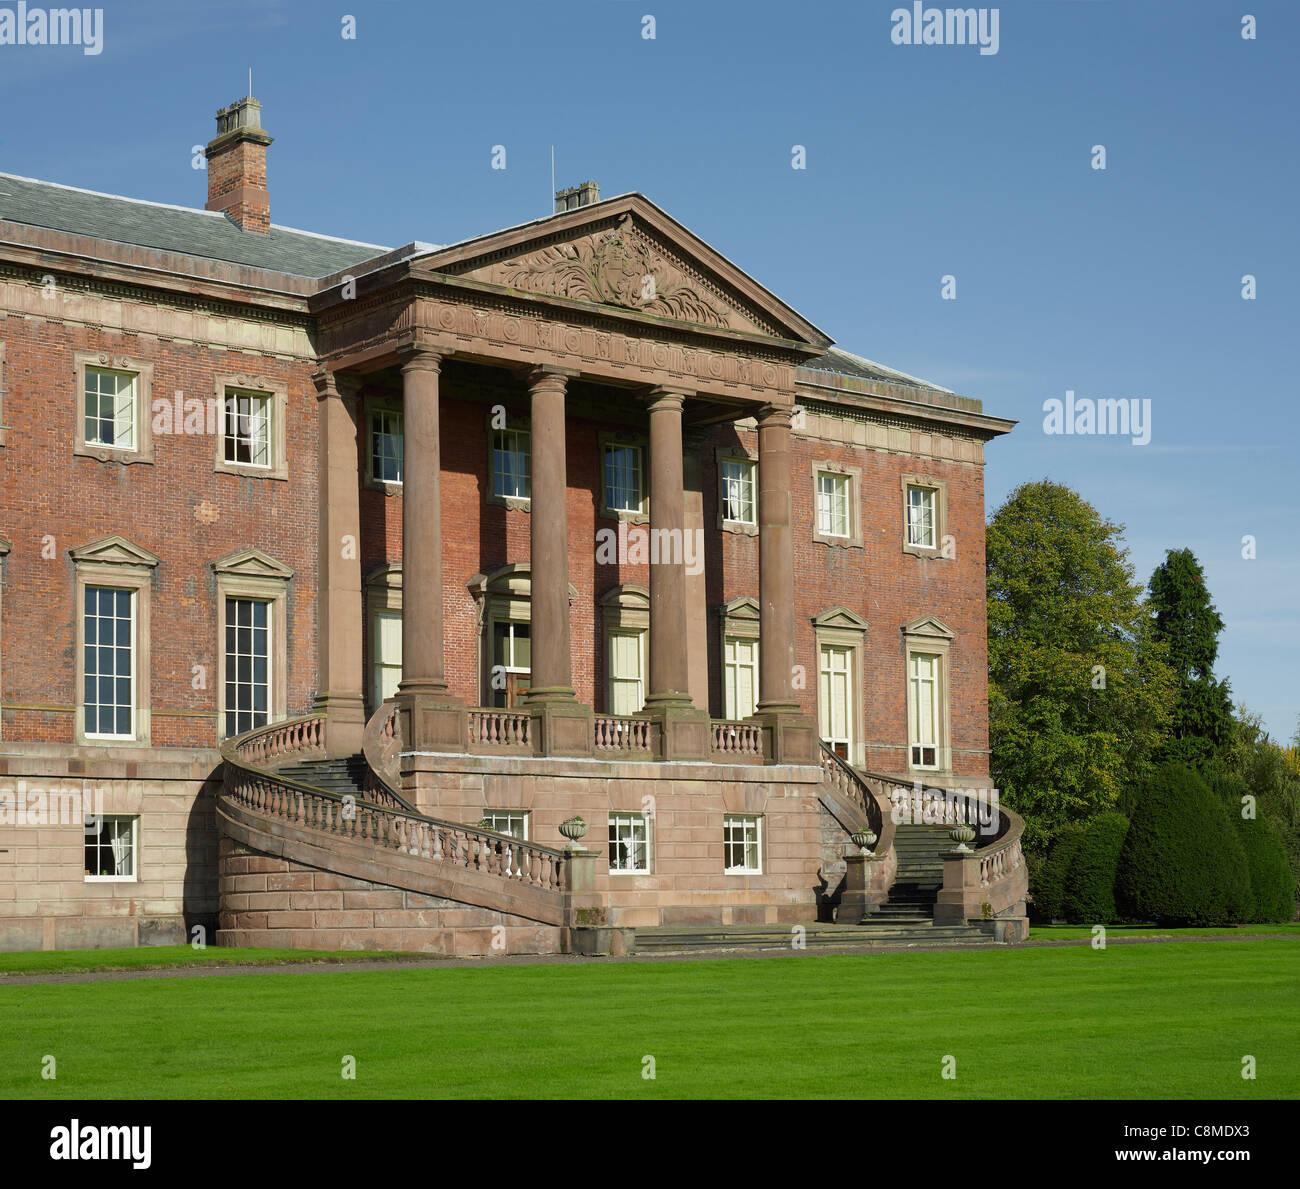 Tabley House, Cheshire Stock Photo